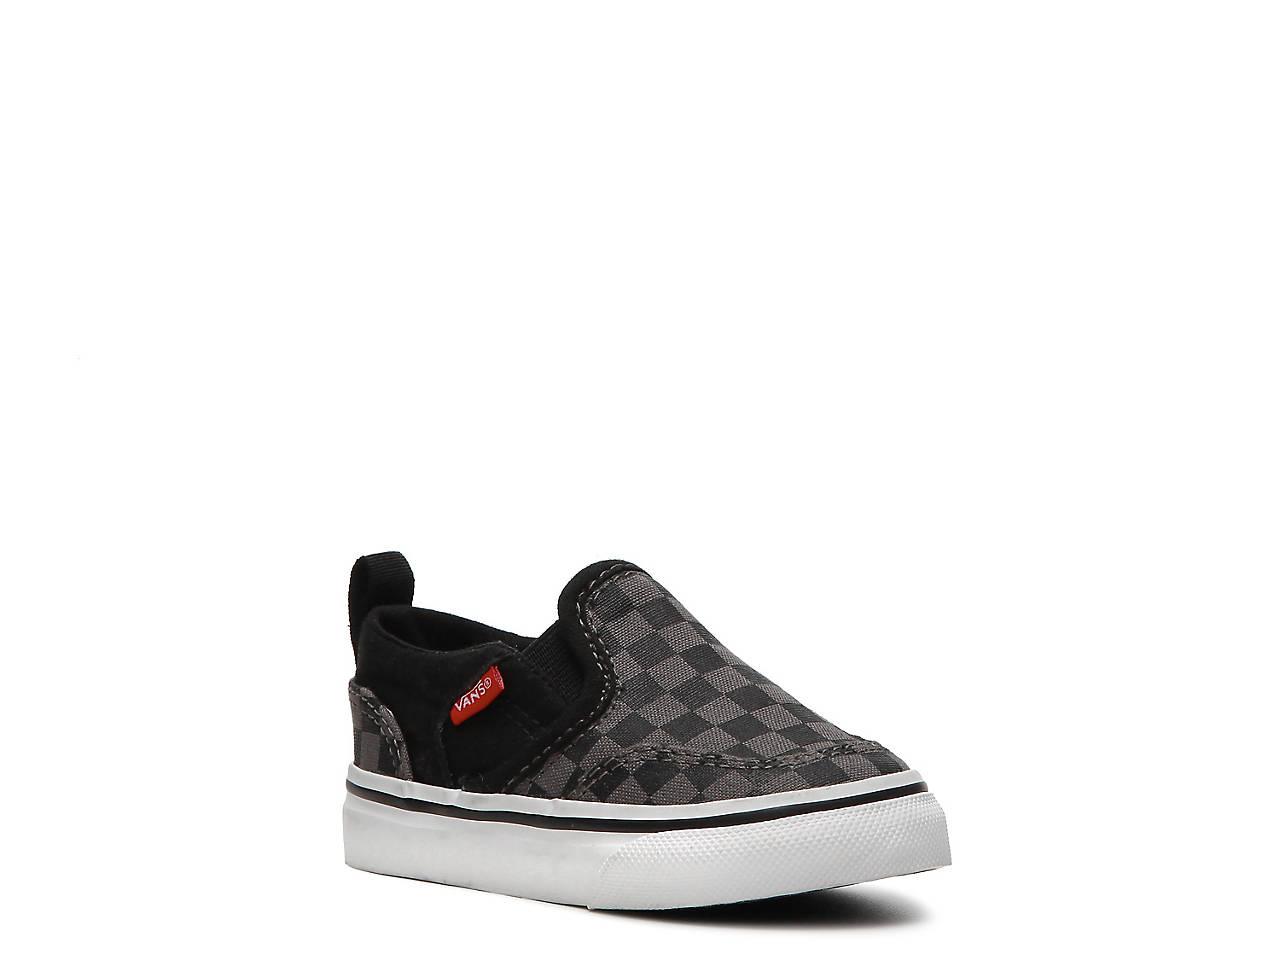 0b54ef99ad21c4 Vans Asher Infant   Toddler Slip-On Sneaker Kids Shoes